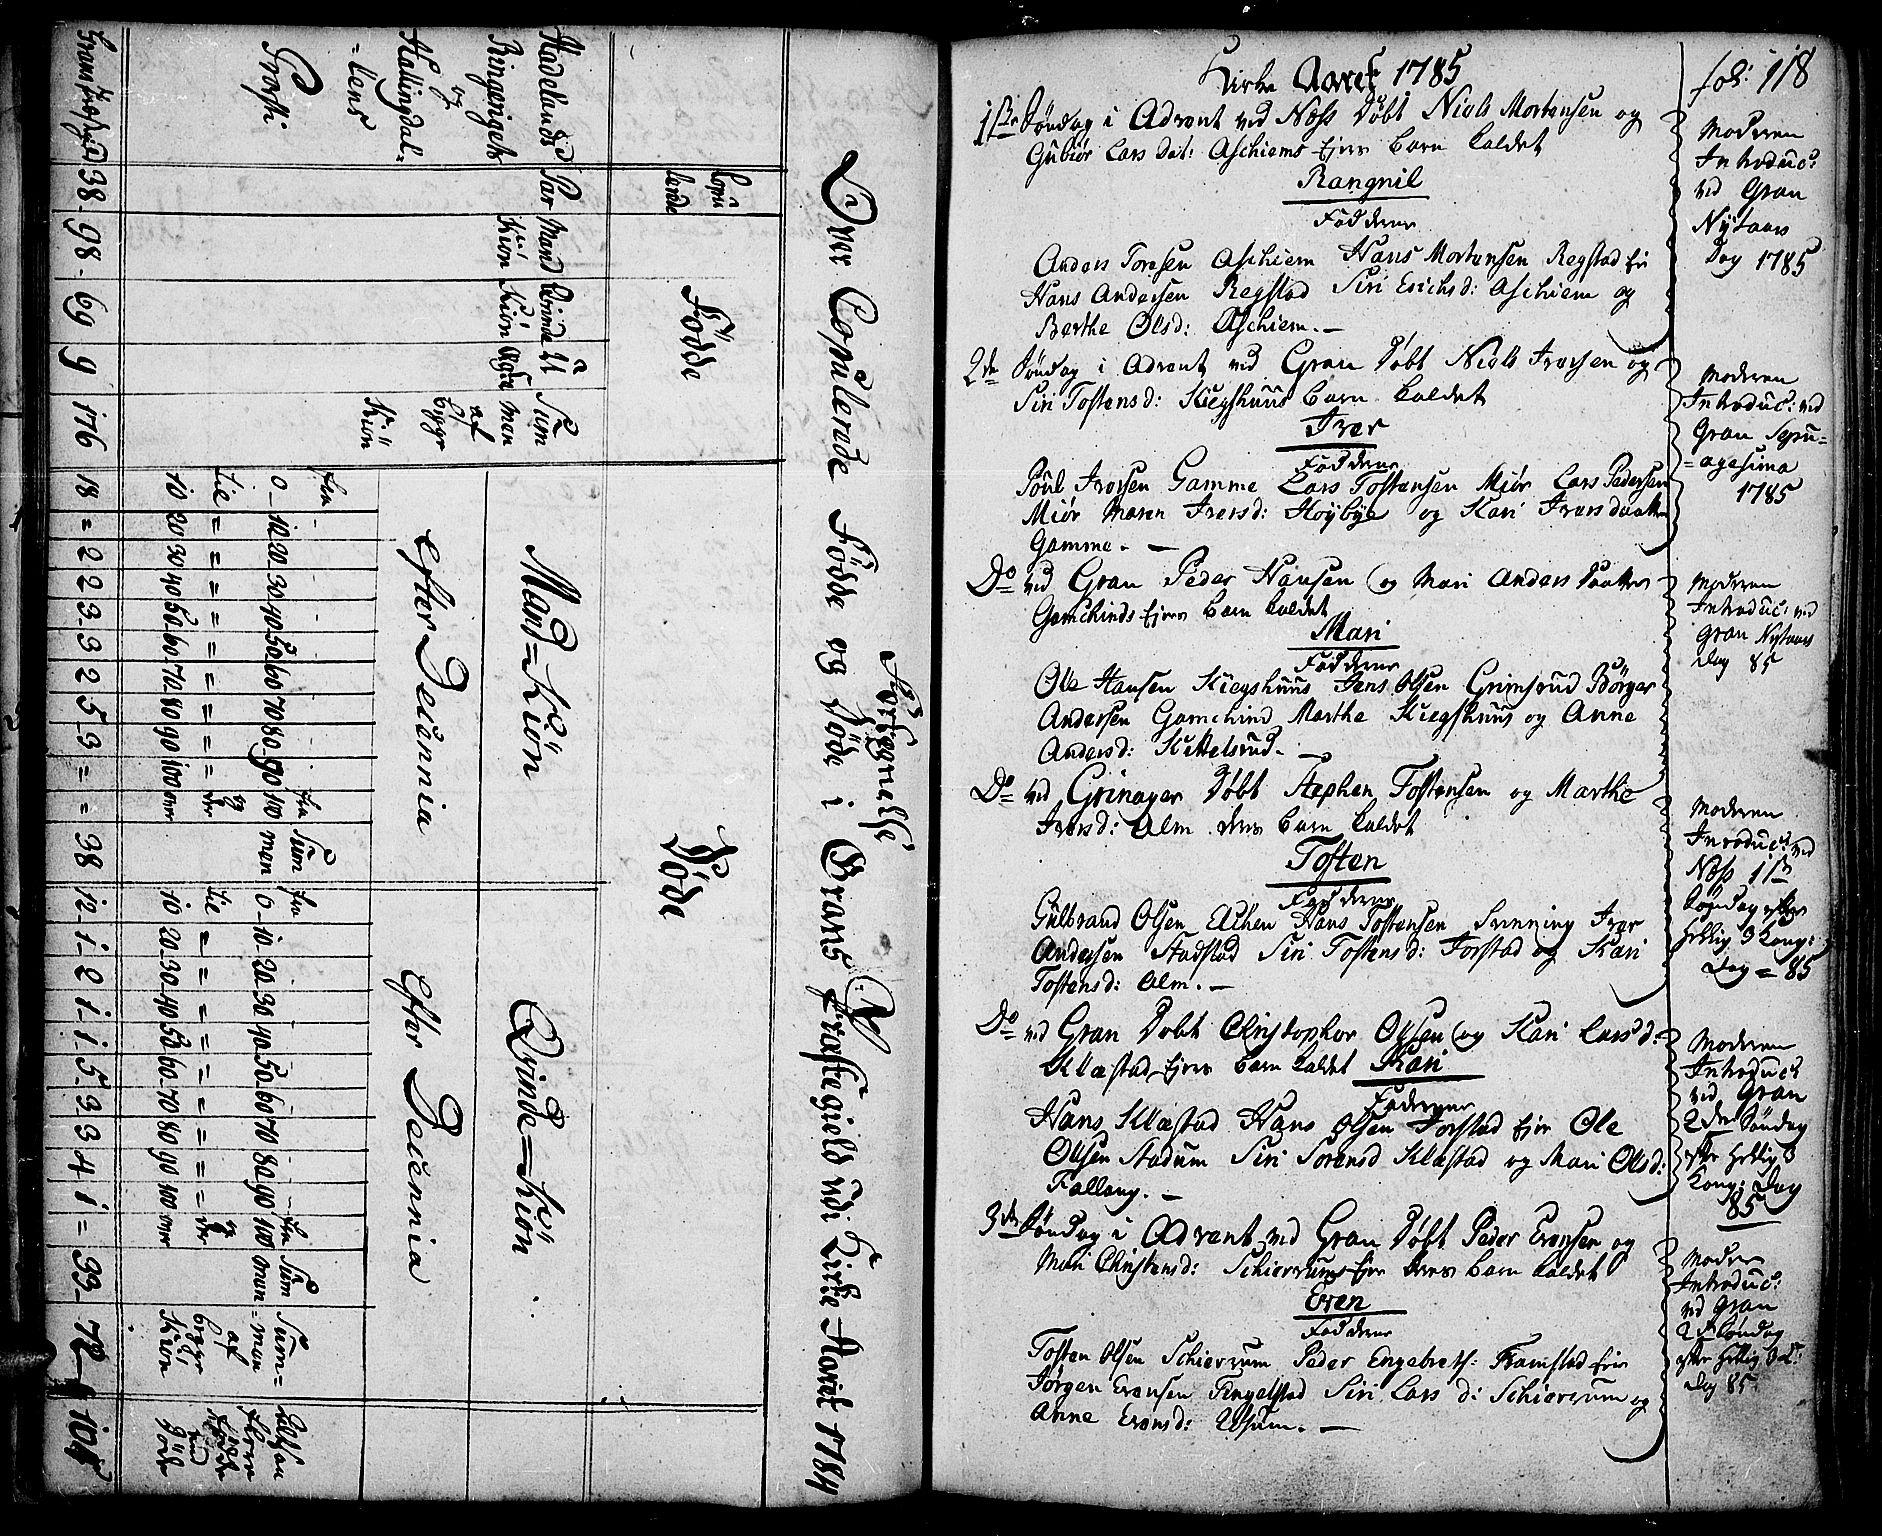 SAH, Gran prestekontor, Ministerialbok nr. 5, 1776-1788, s. 118